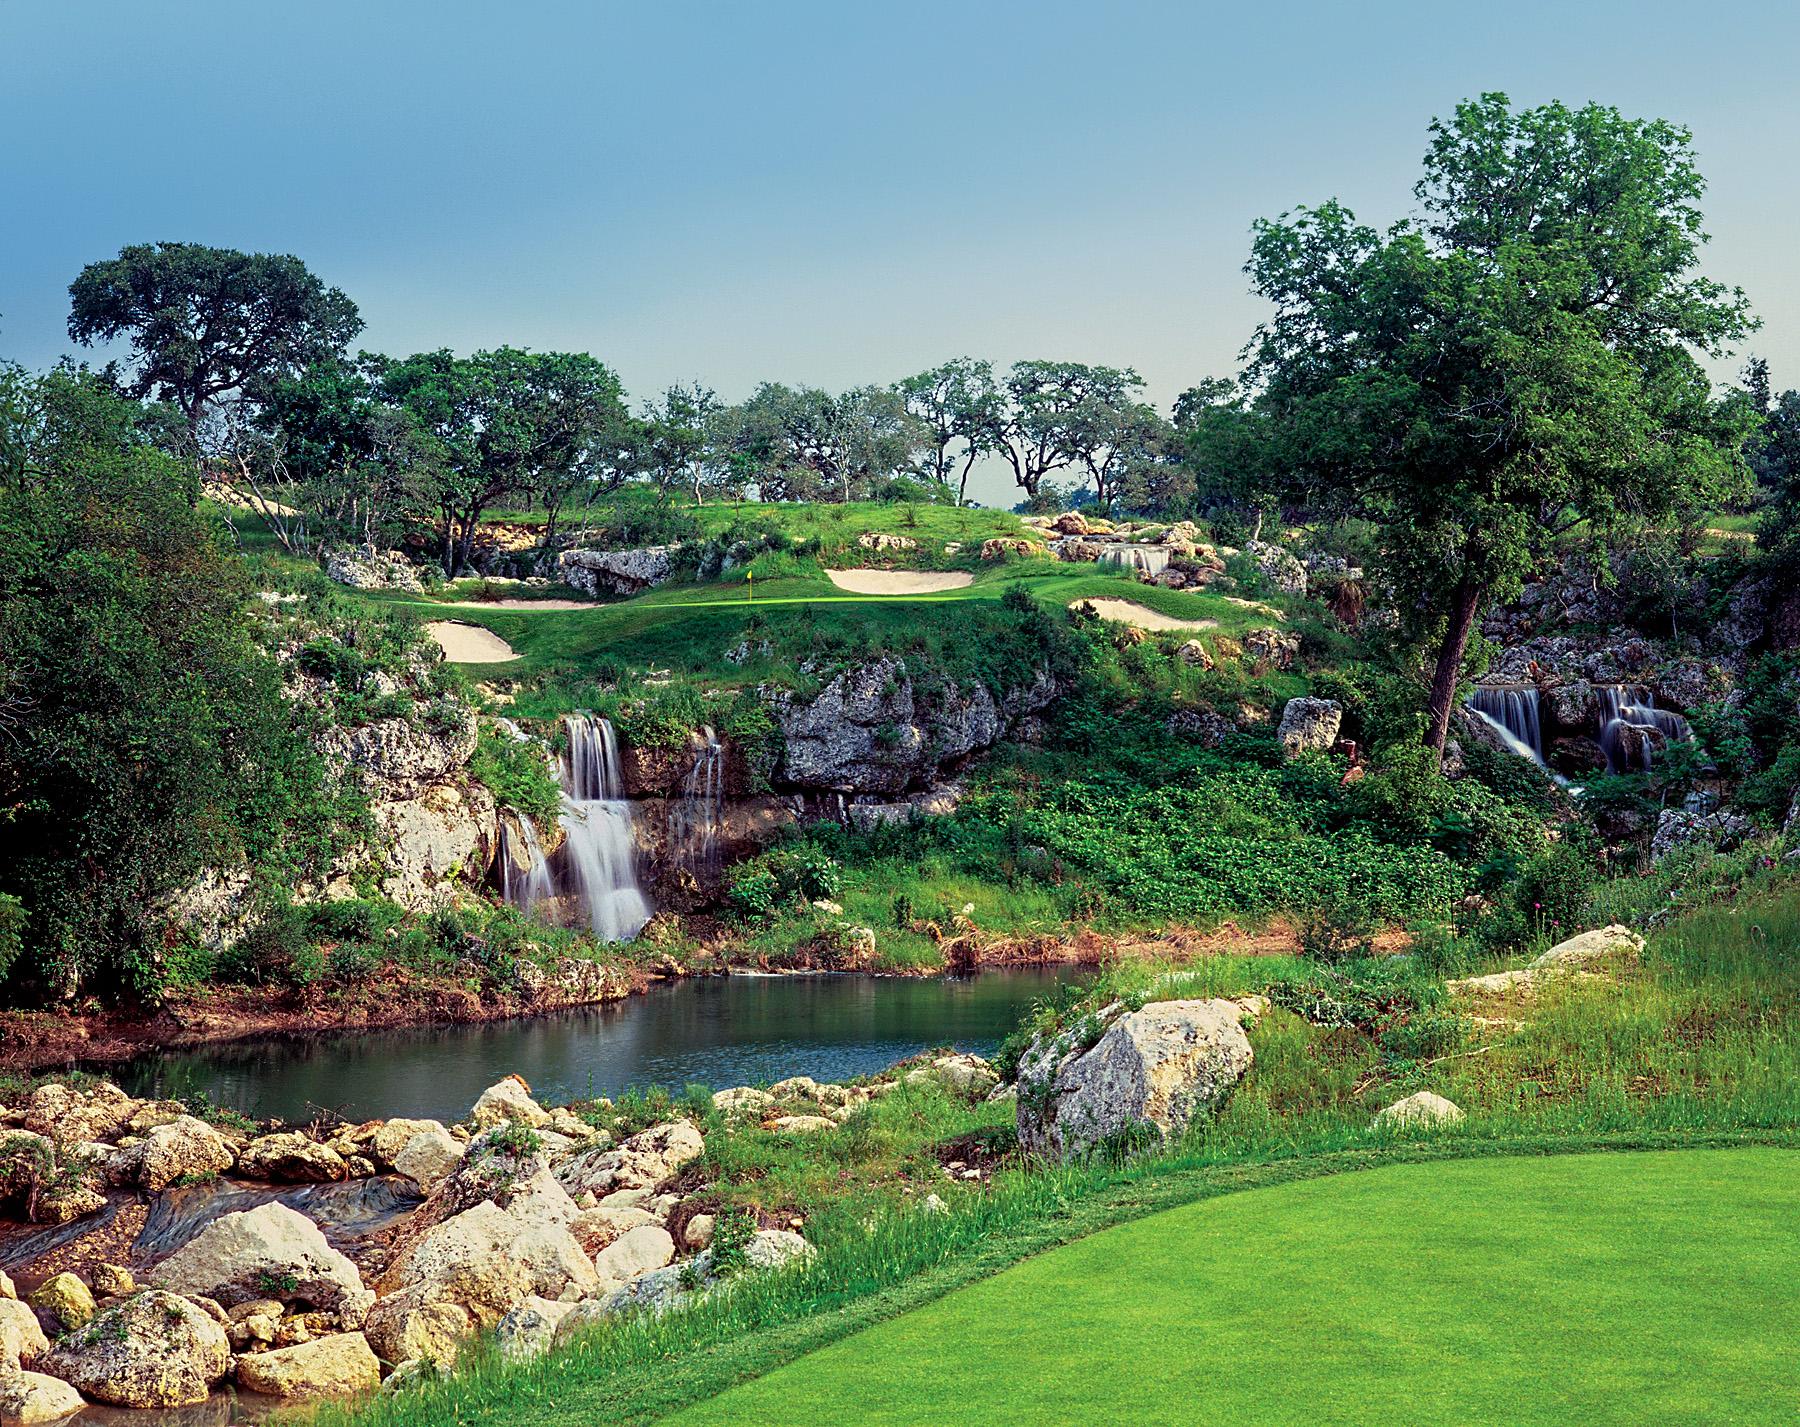 Cordillera Ranch's Jack Nicklaus Signature Golf Course